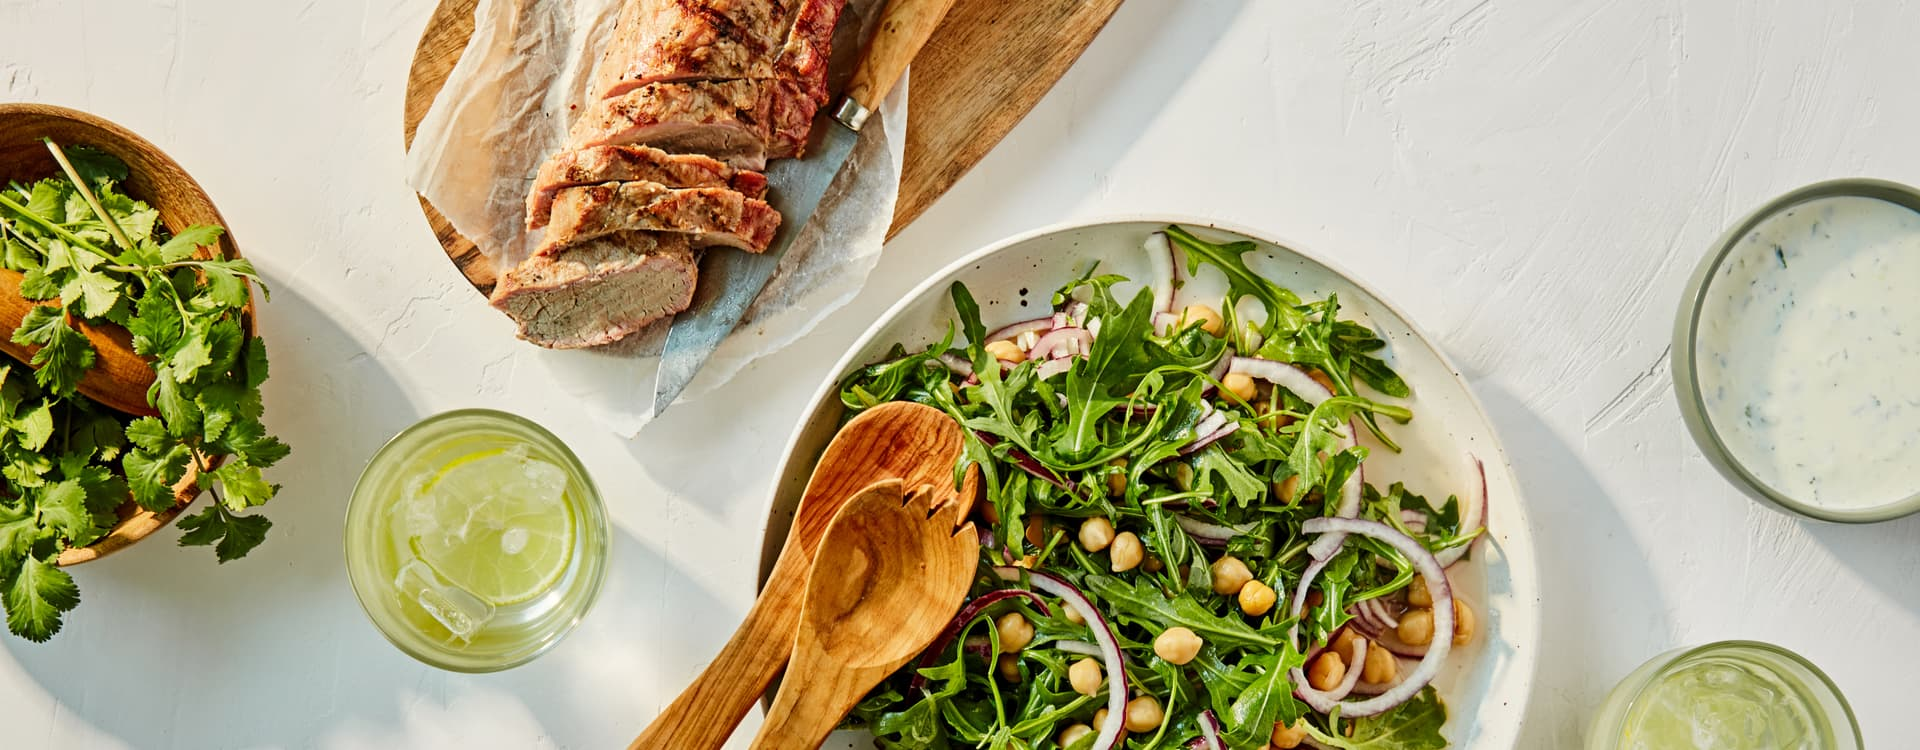 Grillet svinefilet med kikertsalat og korianderdressing